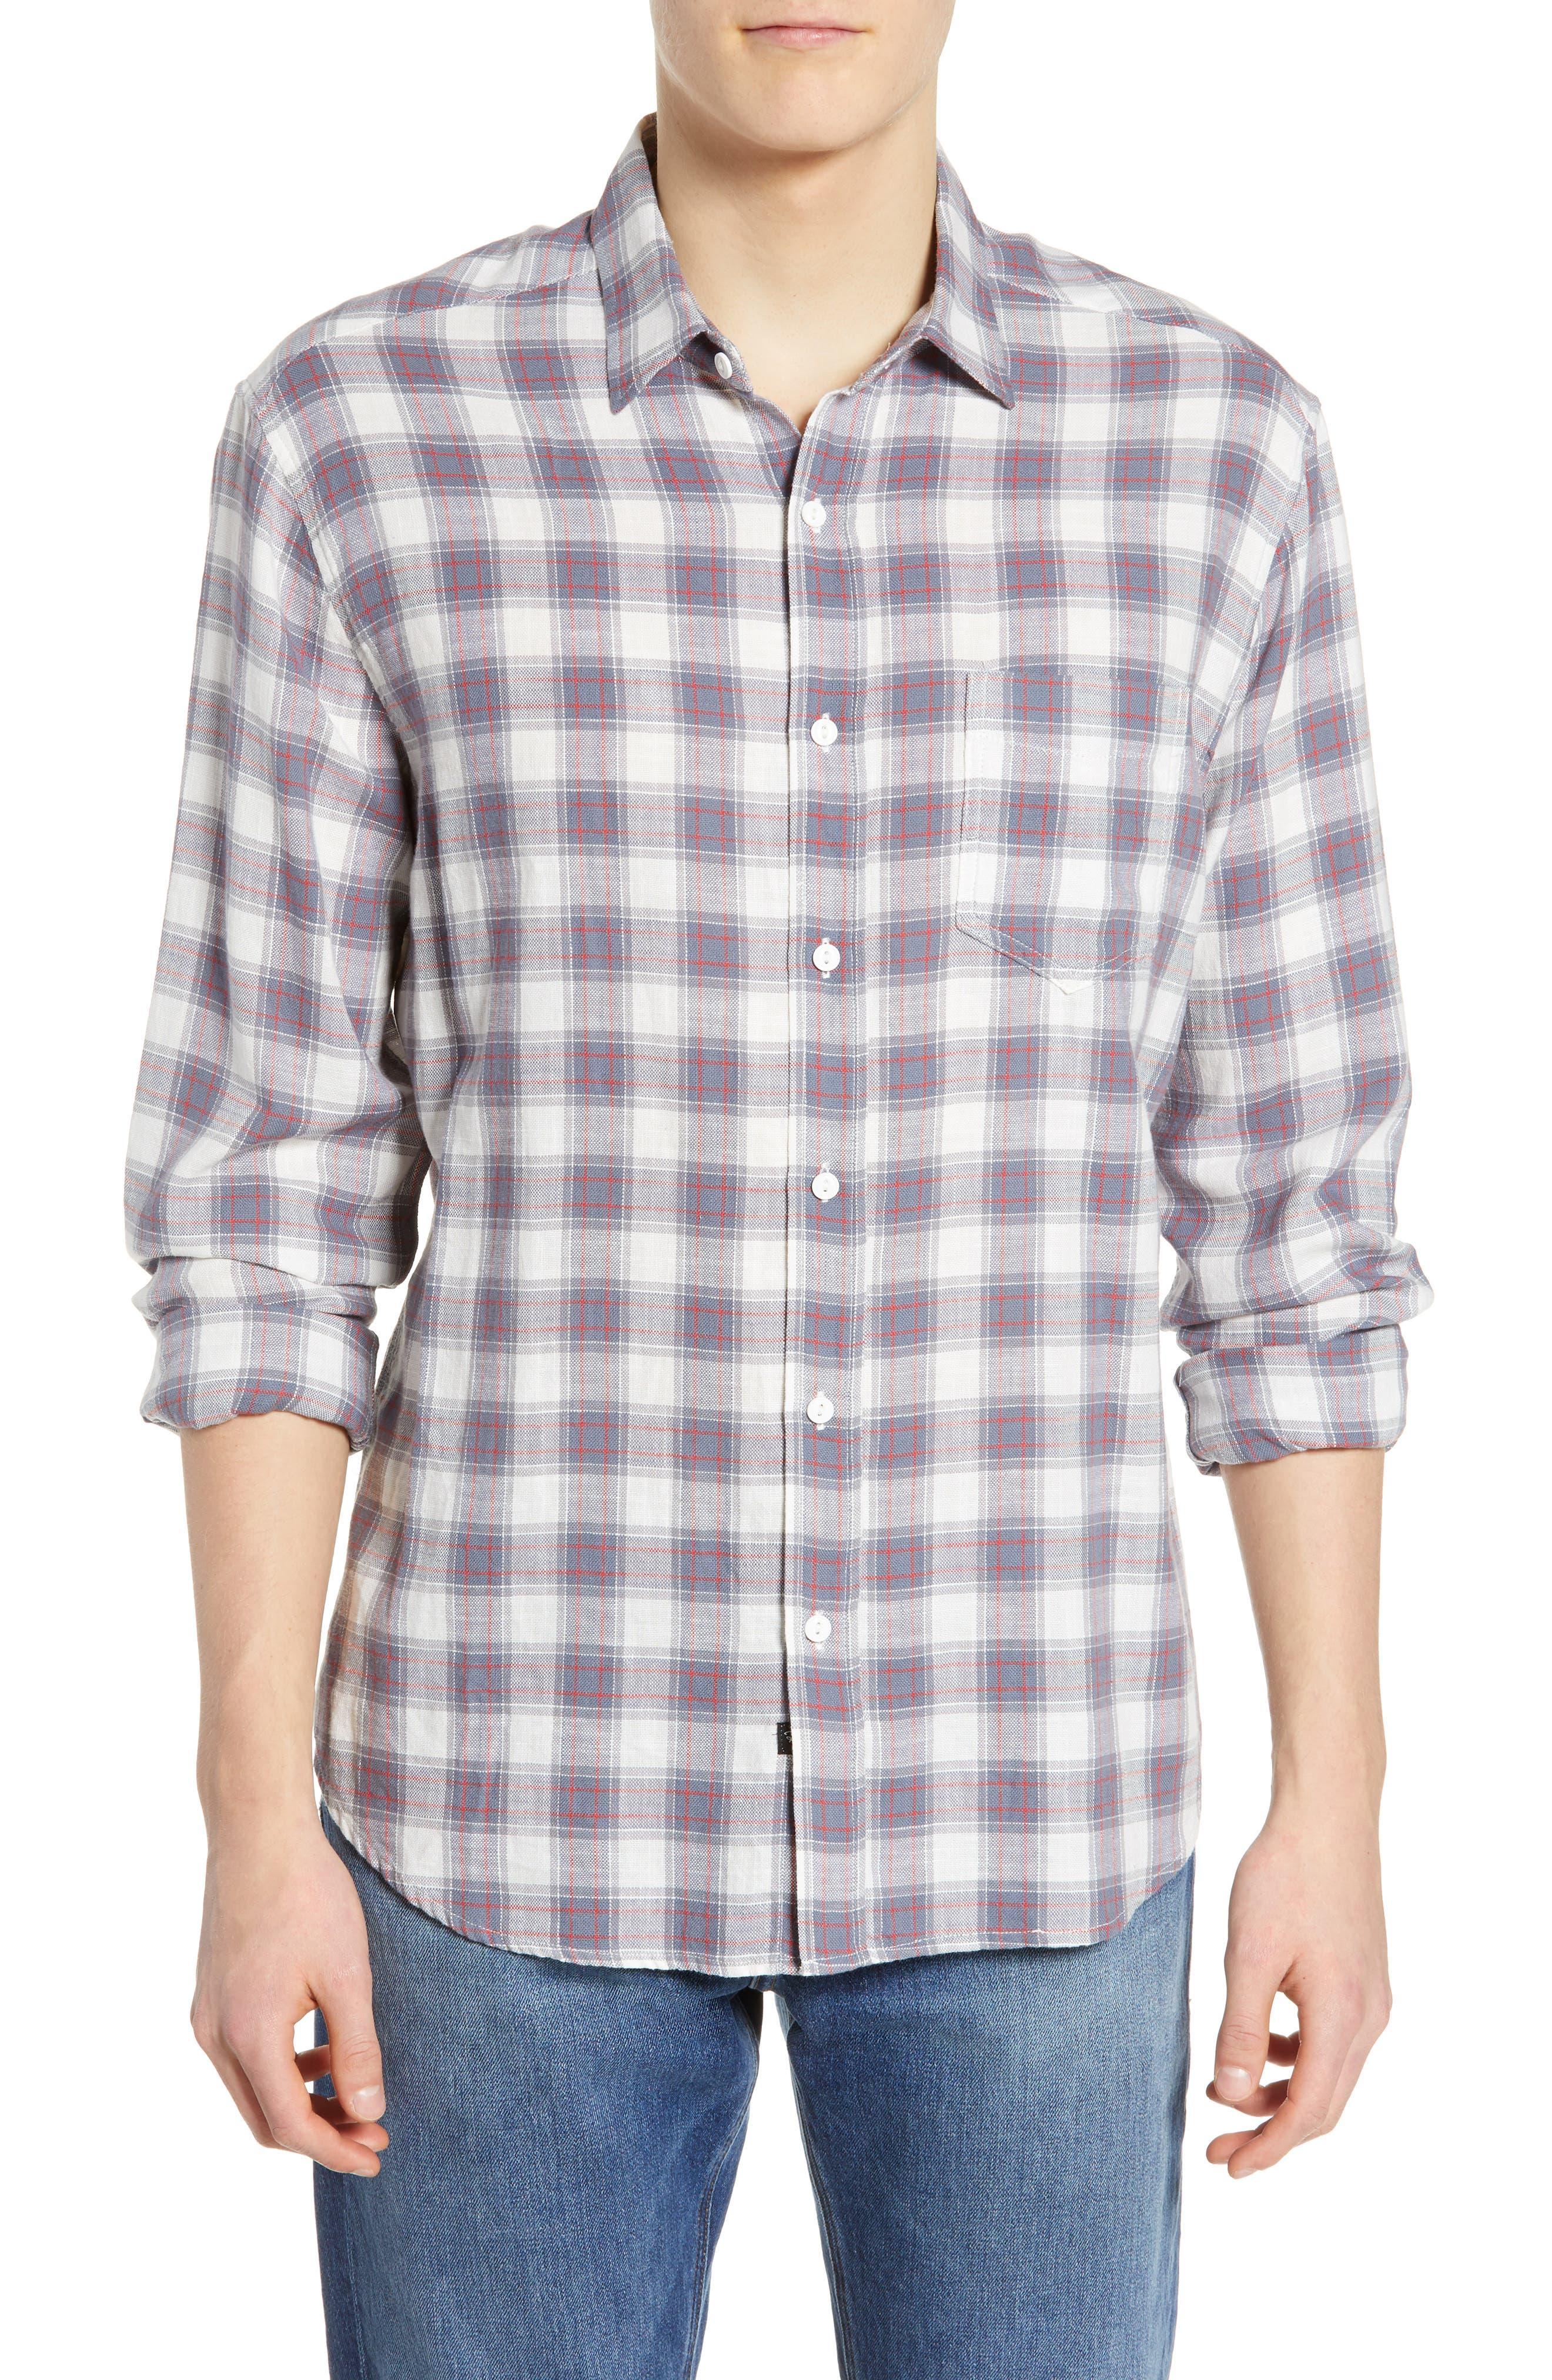 Wyatt Regular Fit Plaid Sport Shirt, Main, color, OCEAN TANGERINE